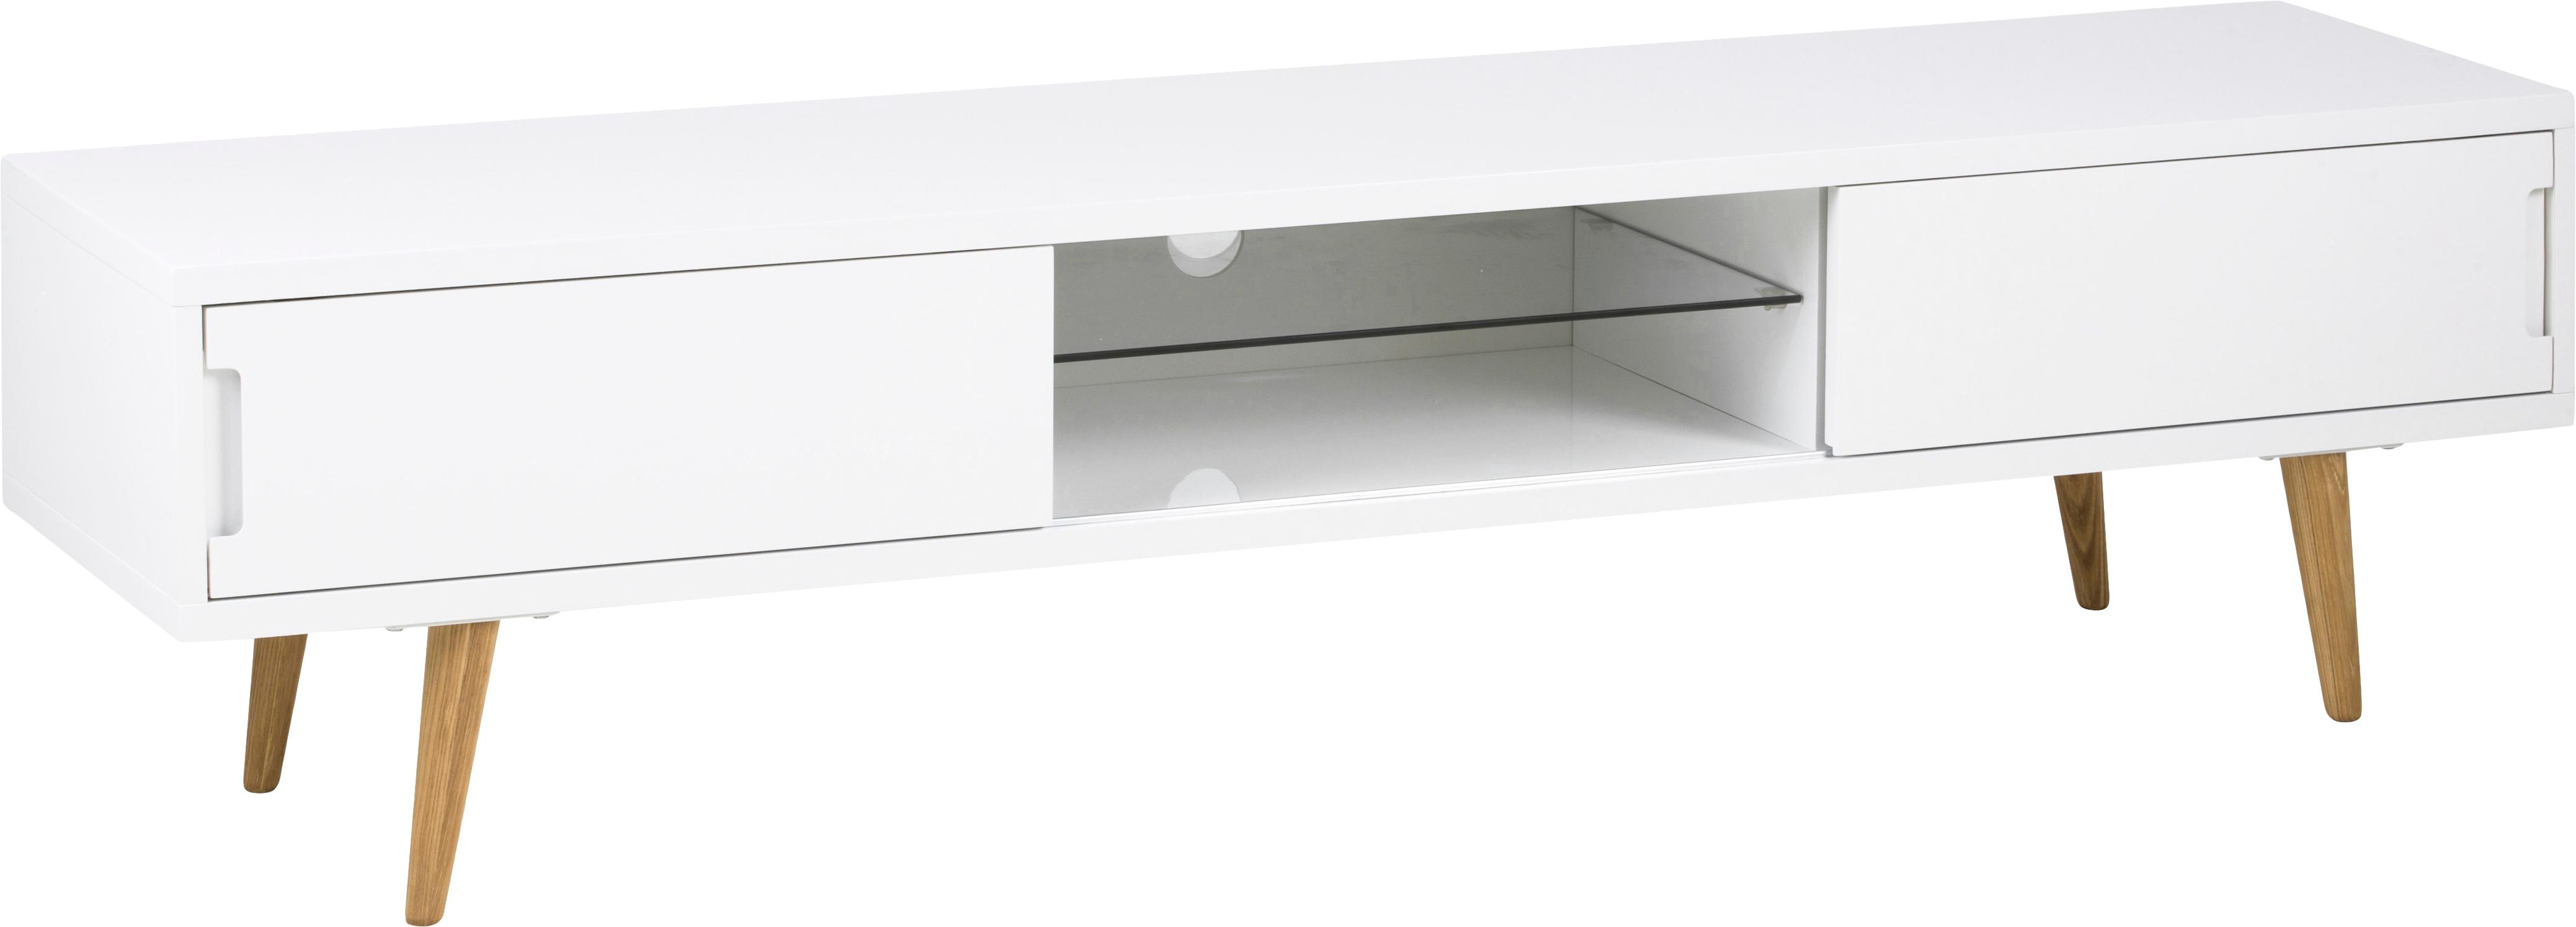 Mueble TV Cassie, Patas: madera de fresno maciza, , Estante: vidrio, Blanco, roble, An 180 x Al 46 cm